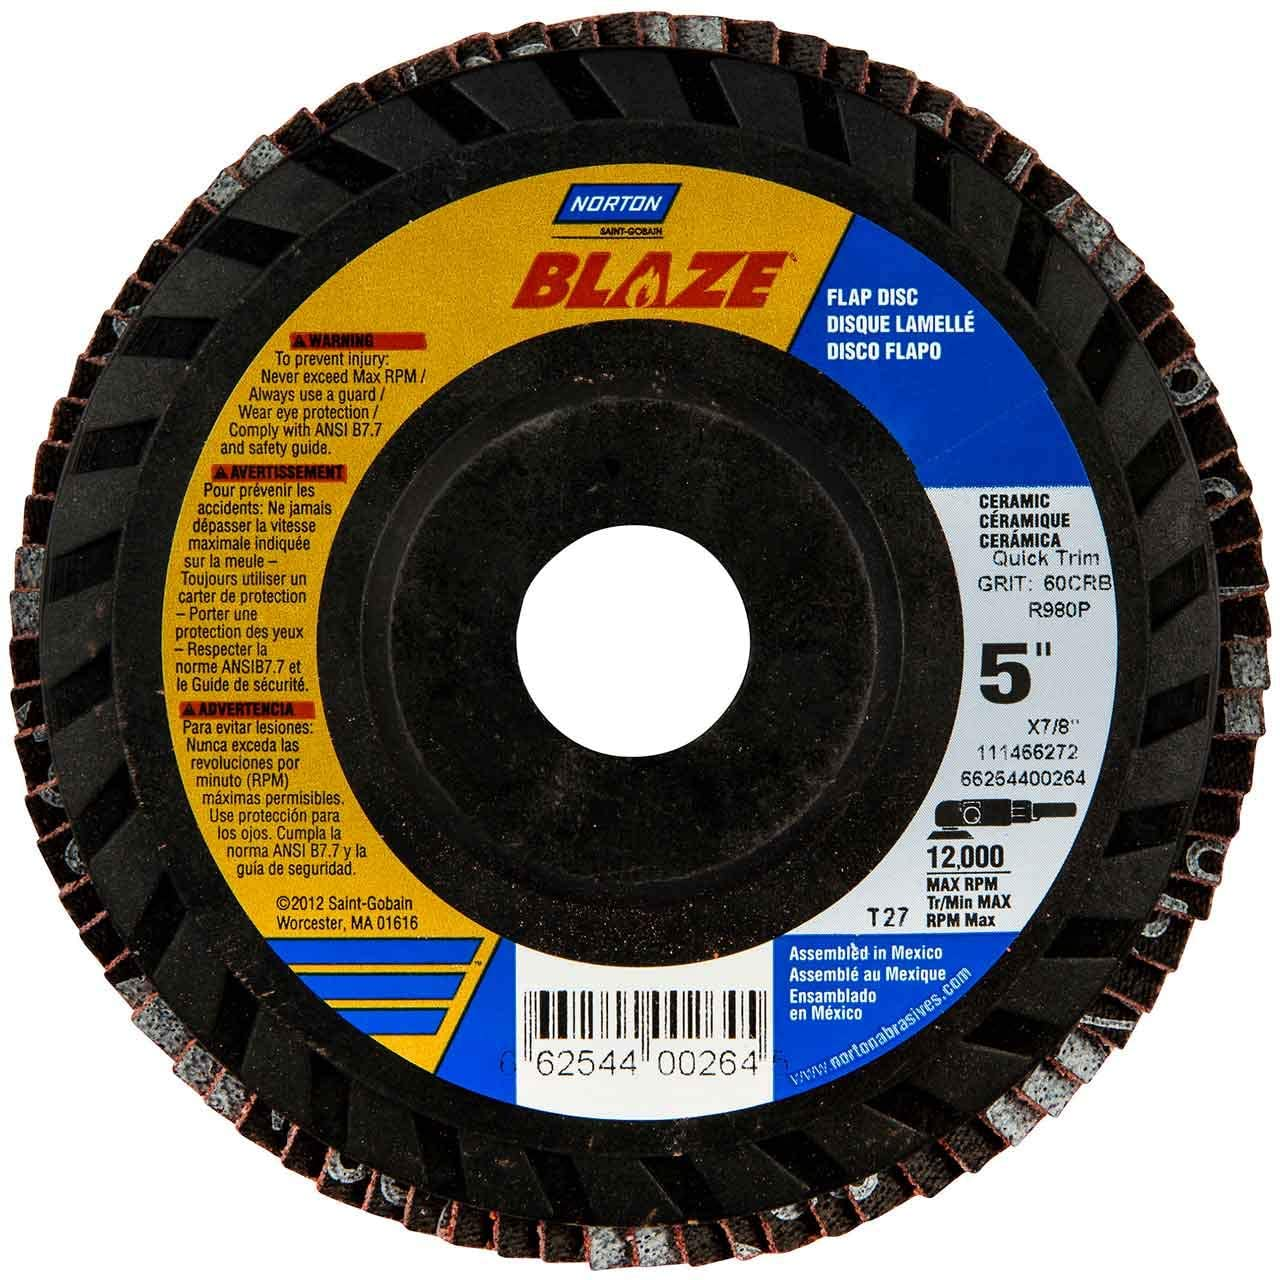 Norton 66254400264 5x7/8 in. Blaze Coated Flap Discs, 60 Grit, 10 pack